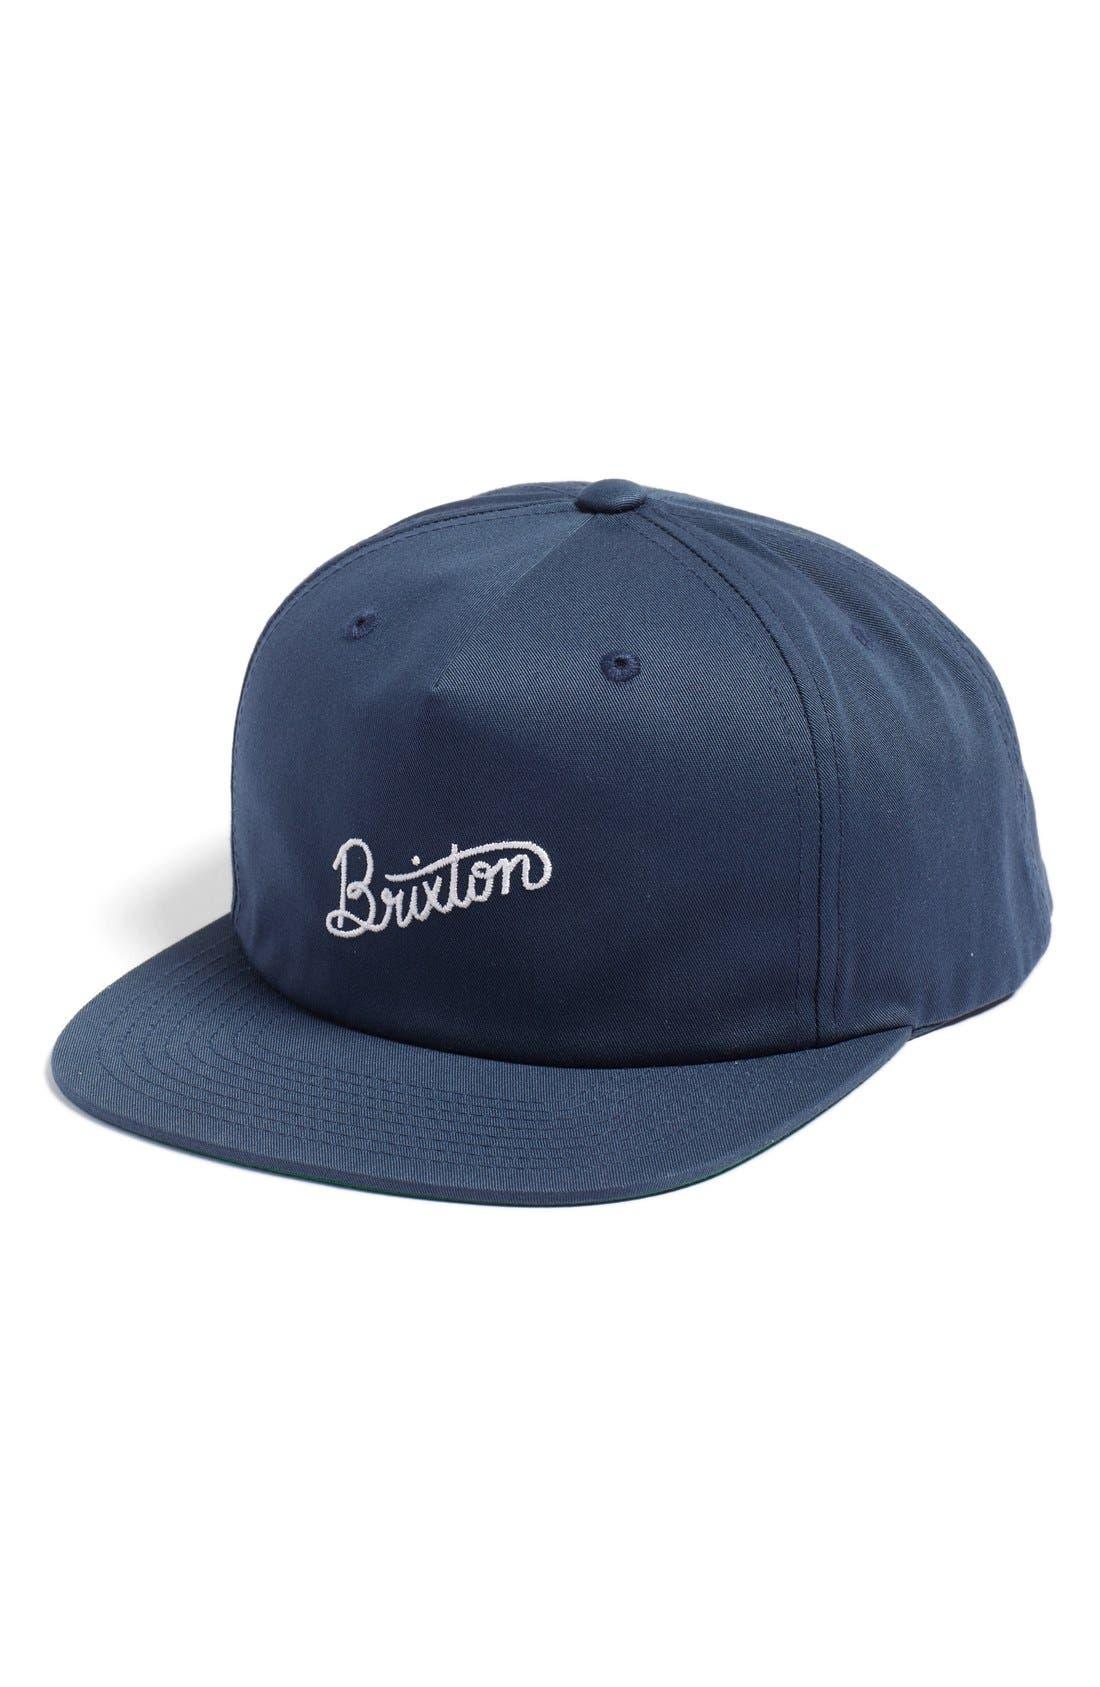 Main Image - Brixton 'Sunder' Snapback Cap